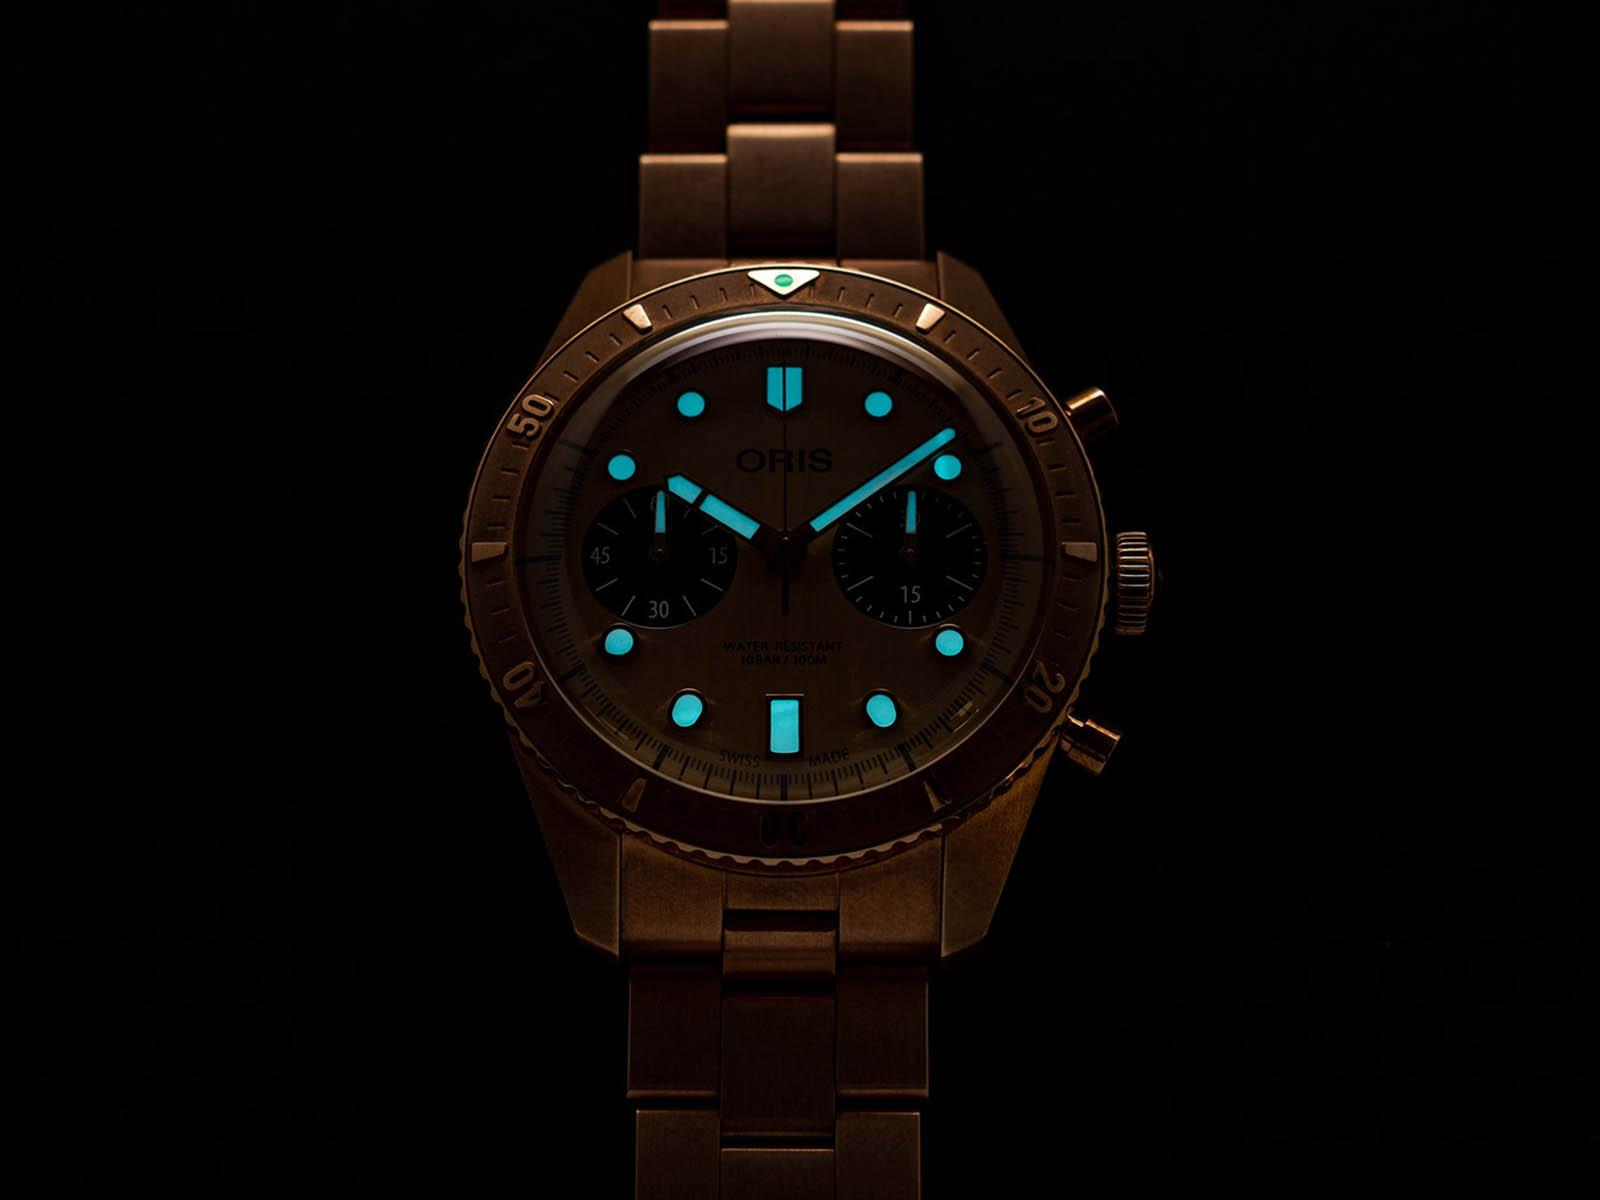 01-771-7744-3182-set-oris-divers-sixty-five-chronograph-holstein-edition-4.jpg